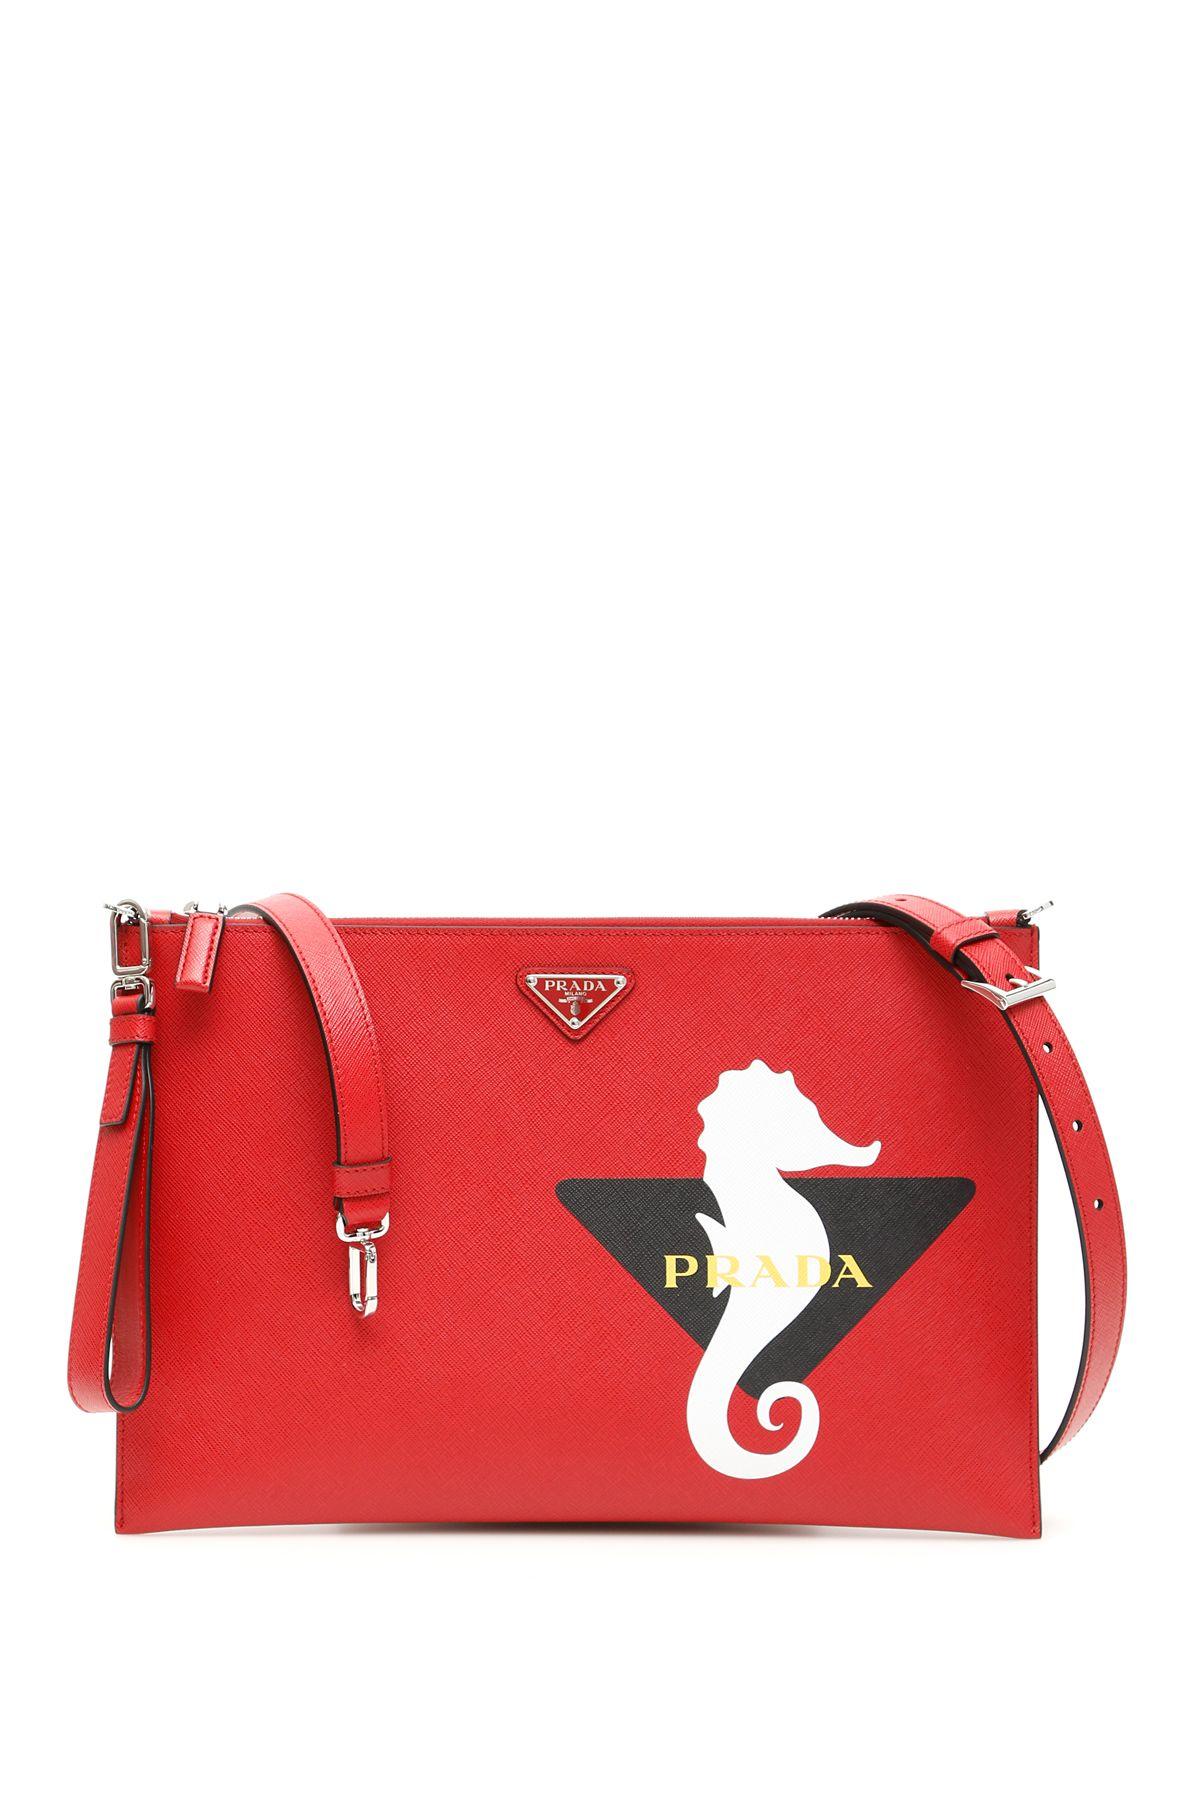 c1cab5b70c5ae8 Prada Prada Seahorse Logo Clutch - FUOCO BIANCO (Red) - 10839618 ...